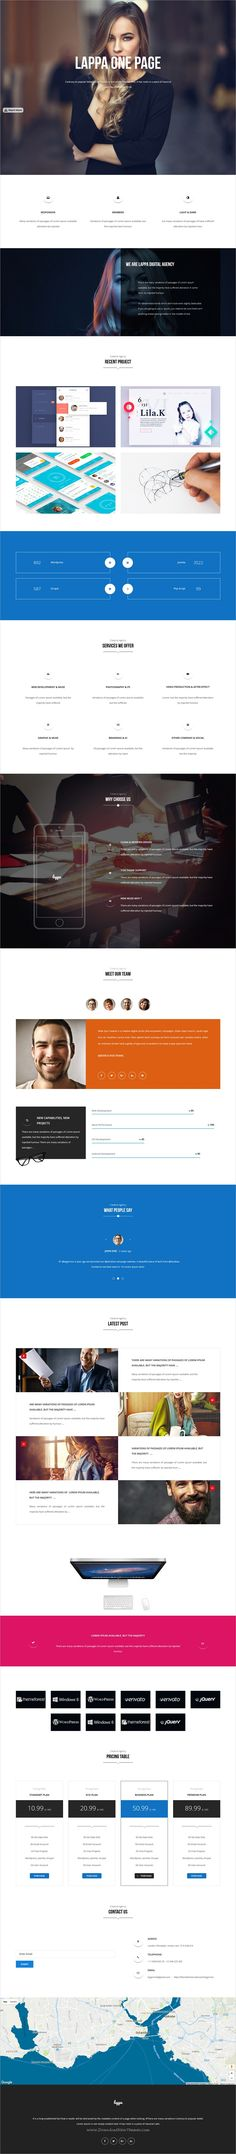 Sam Martin - Personal vCard Resume HTML Template Website - resume html template